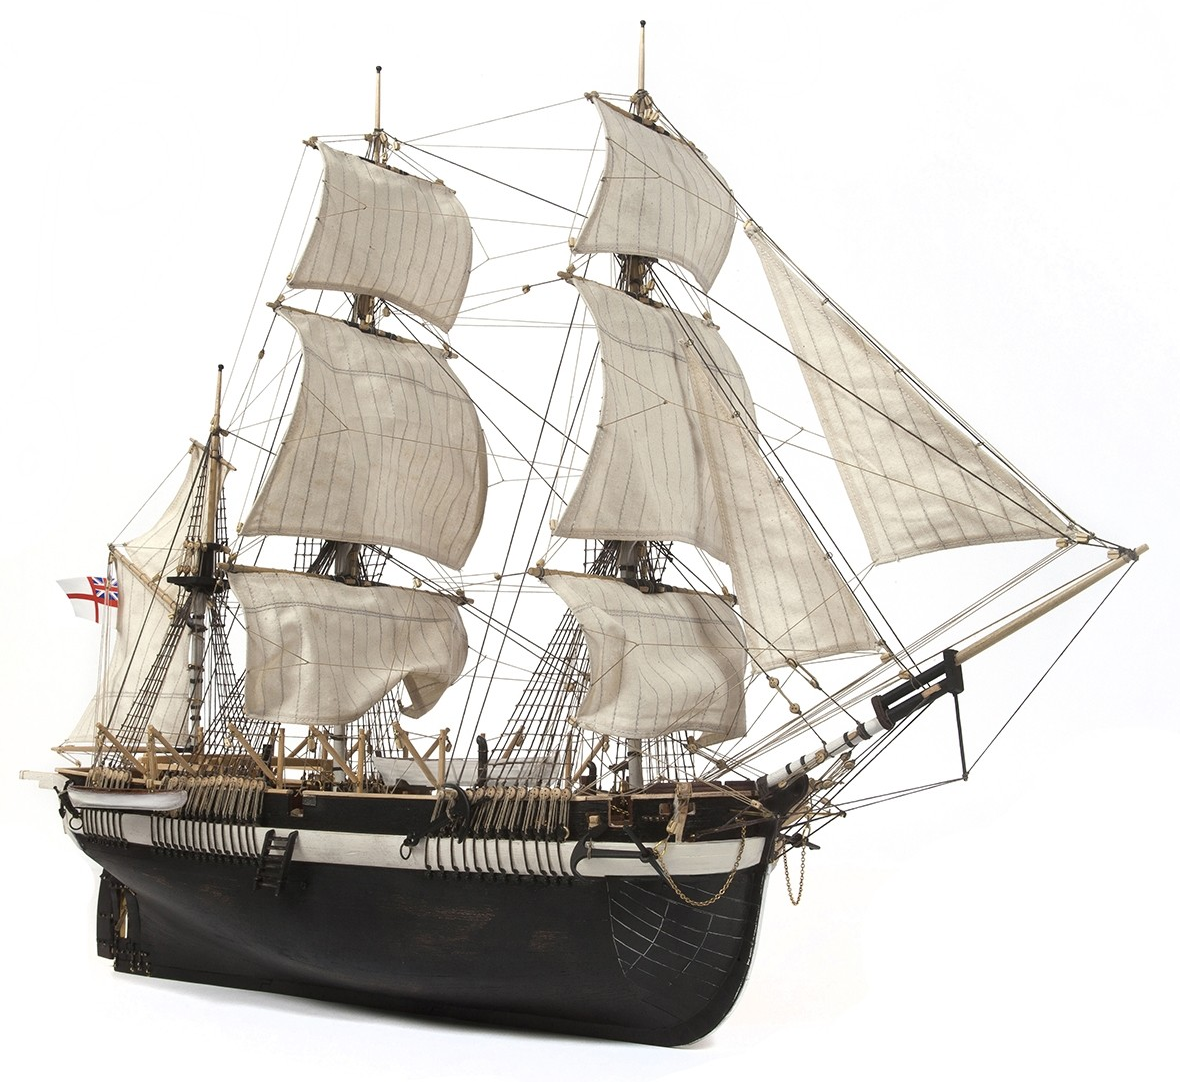 Boat Kits Product : Occre hms terror wooden model ship kit boat